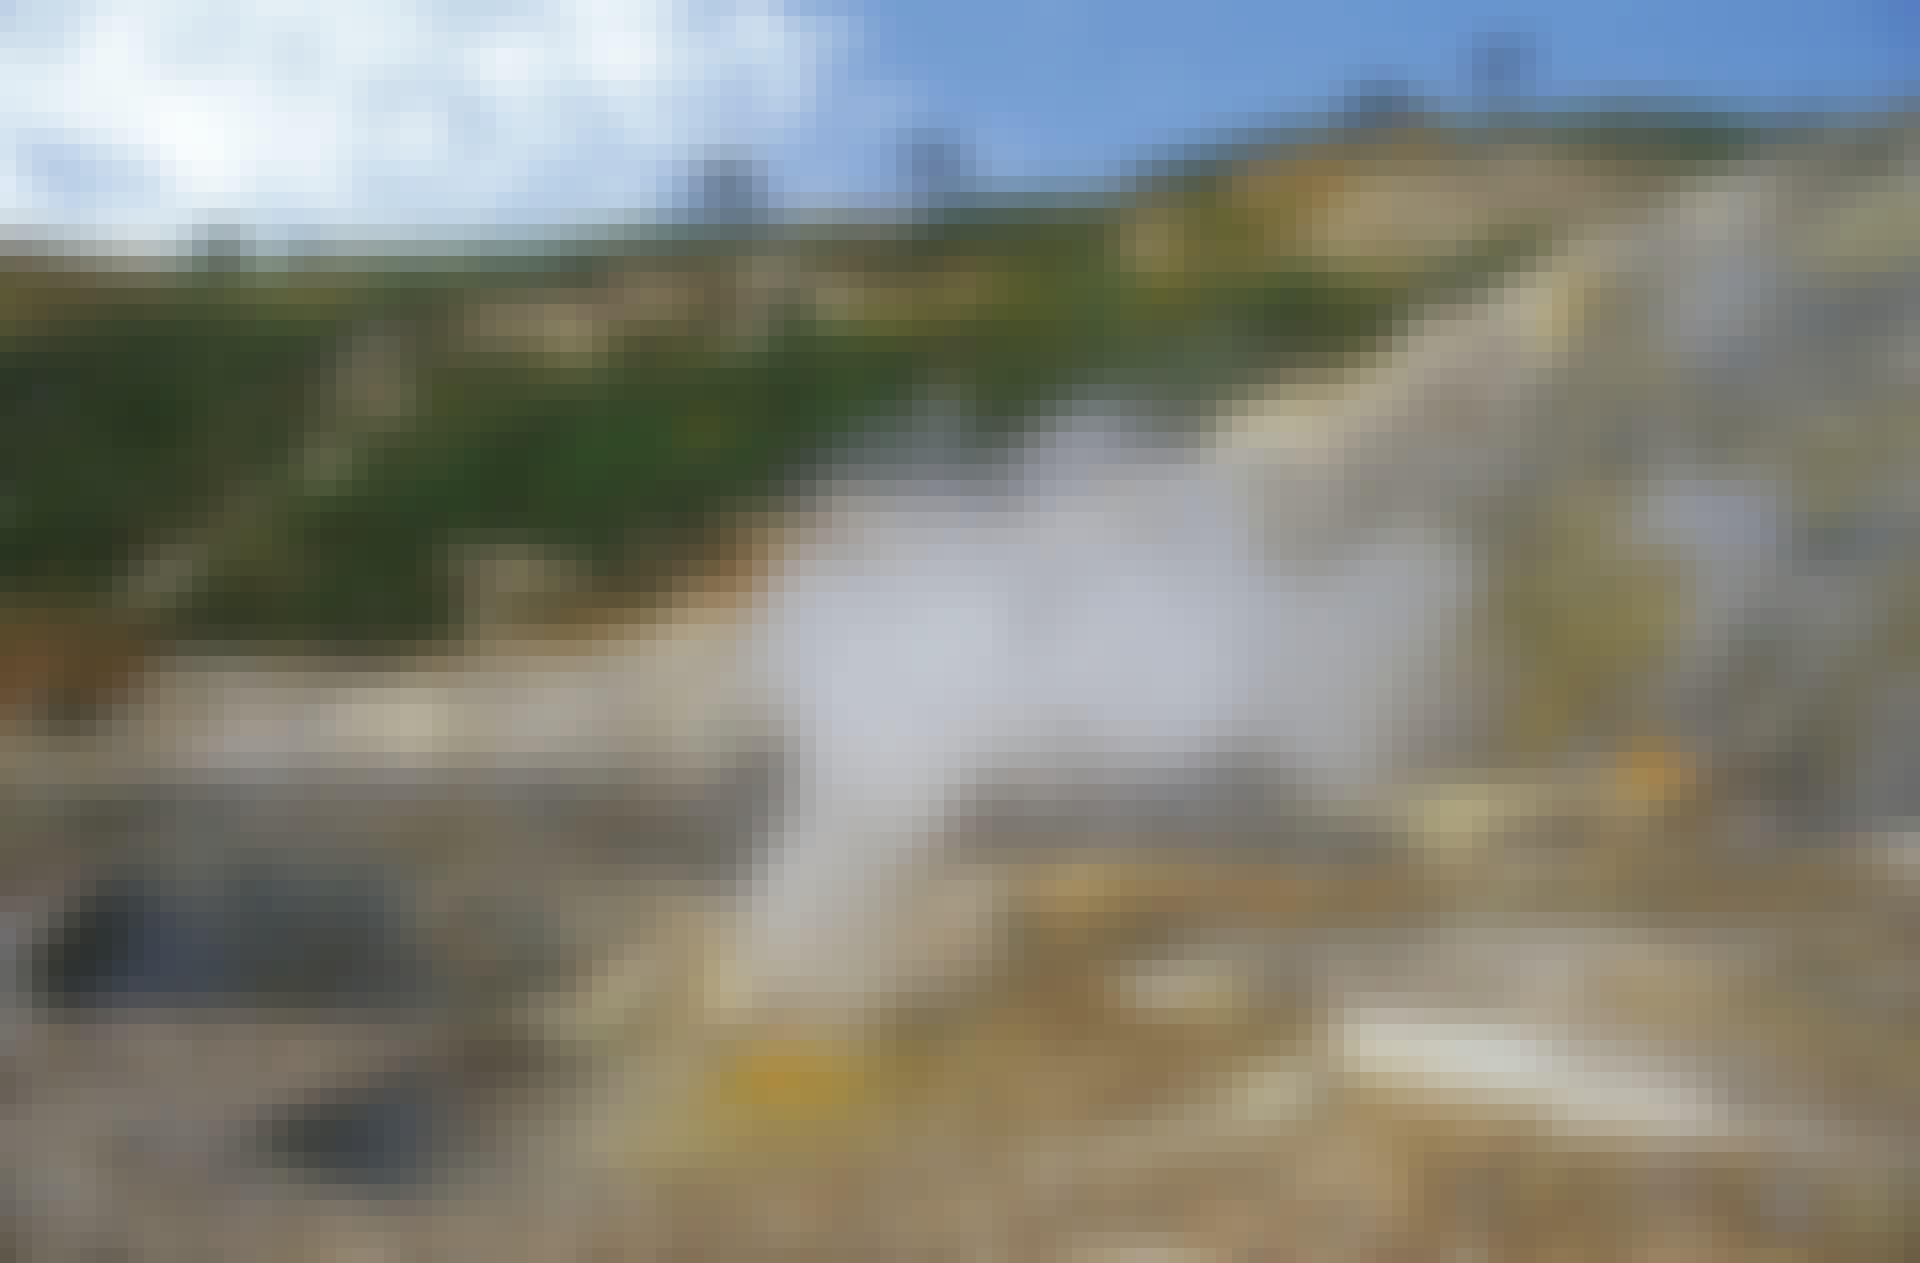 Vulcano Campi Flegrei